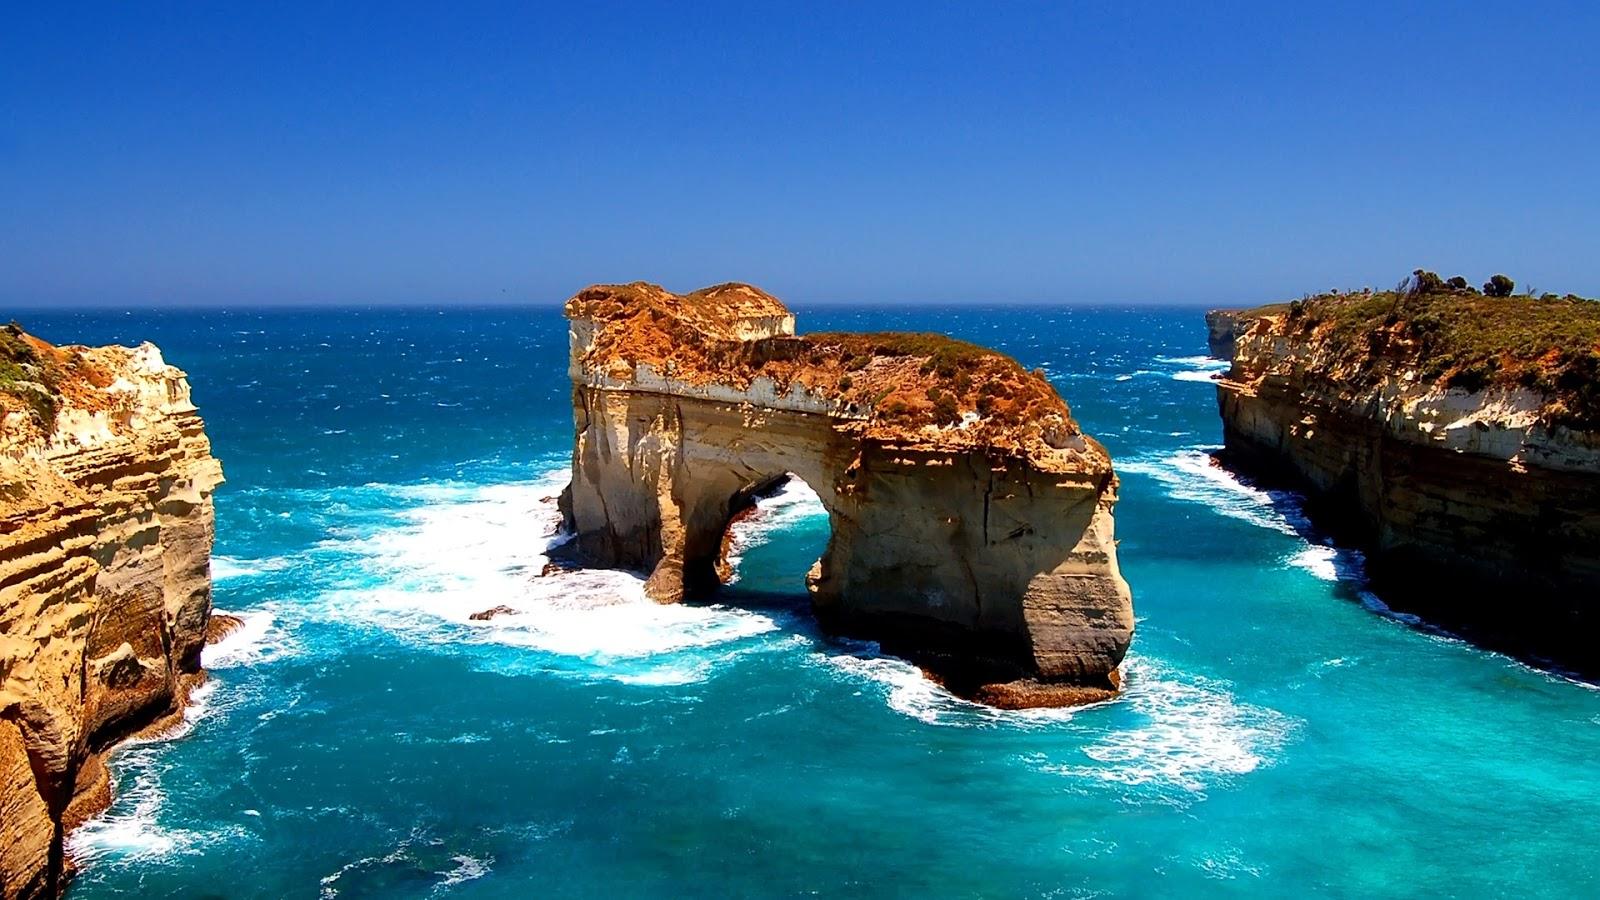 Islands Of Australia: Wallpapers World: Island-archway-australia-hd-1080p